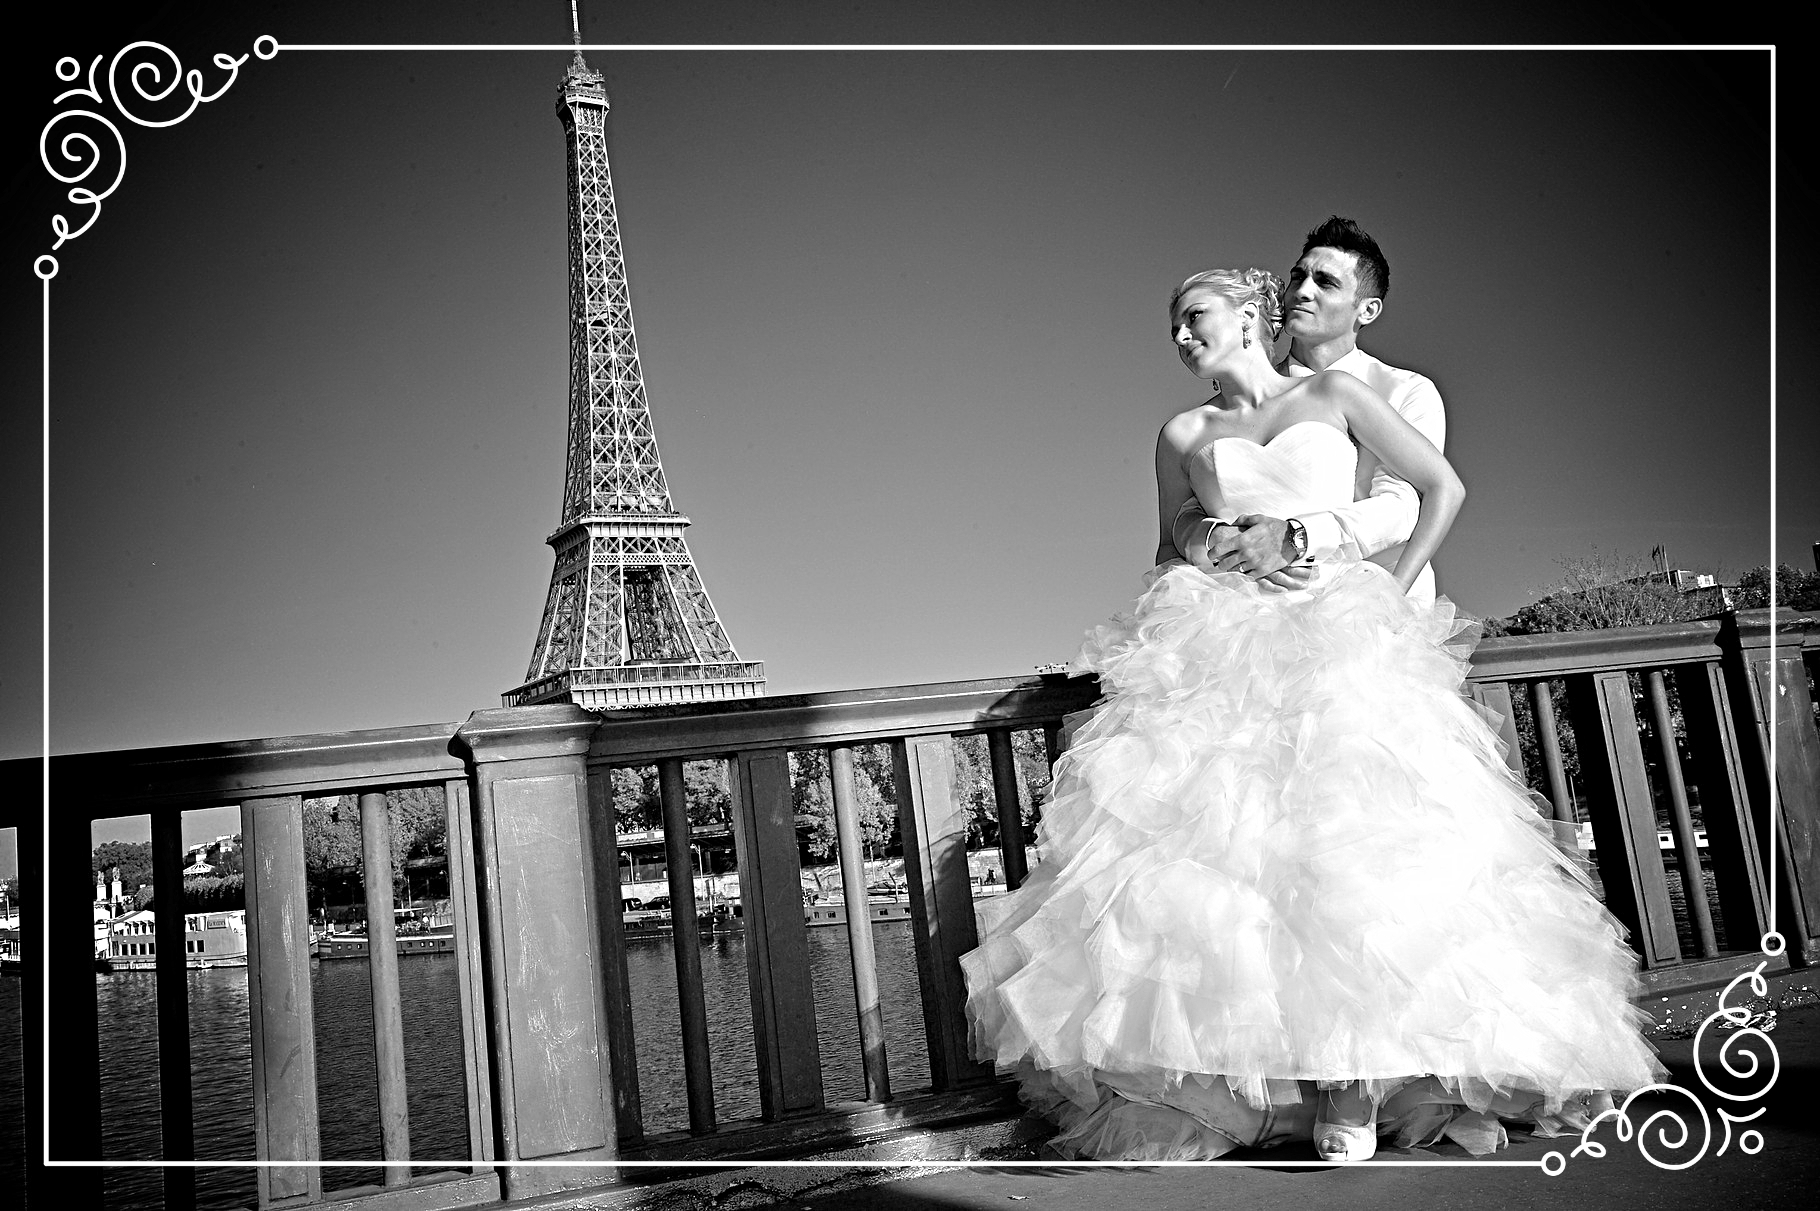 agence mariage dream photographe de mariage mariage mariage pas chers photo et vid o de. Black Bedroom Furniture Sets. Home Design Ideas